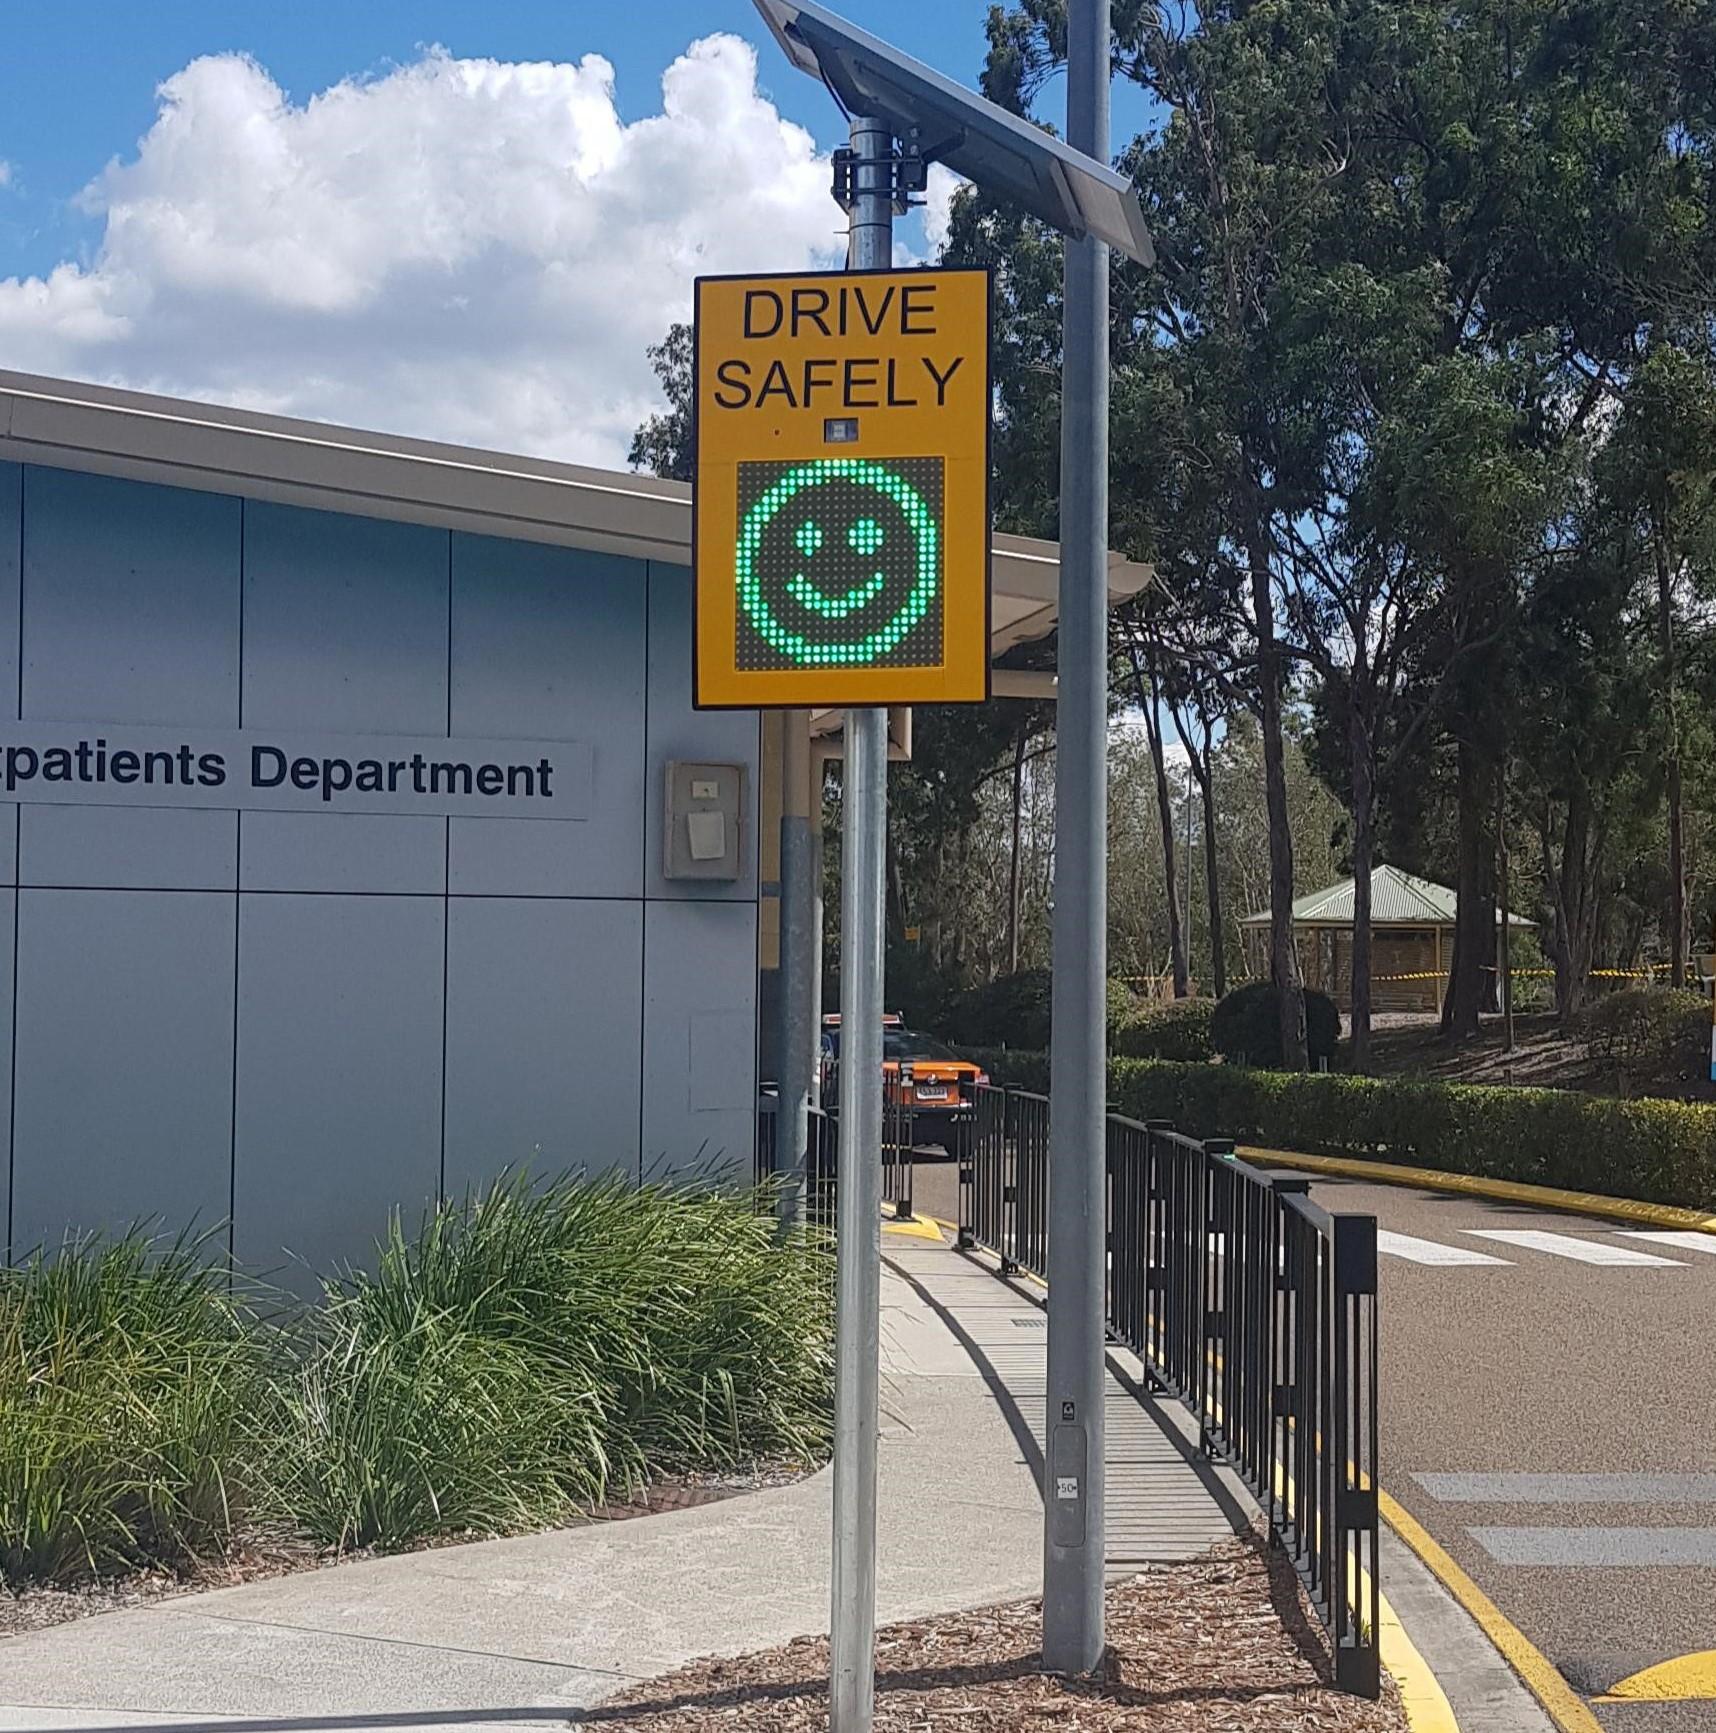 Voxson Radar Speed Sign in Hospital Entrance